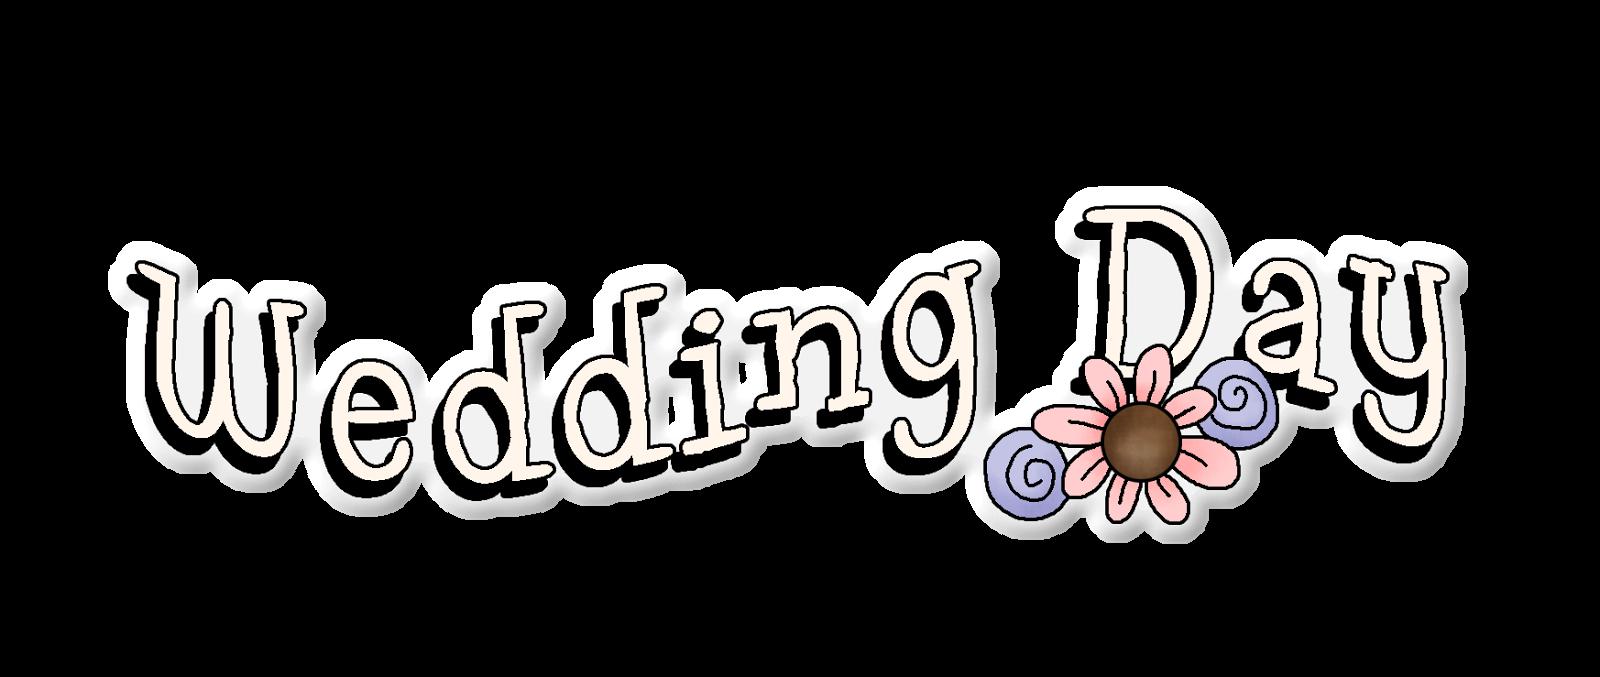 clip art free wedding images - photo #30